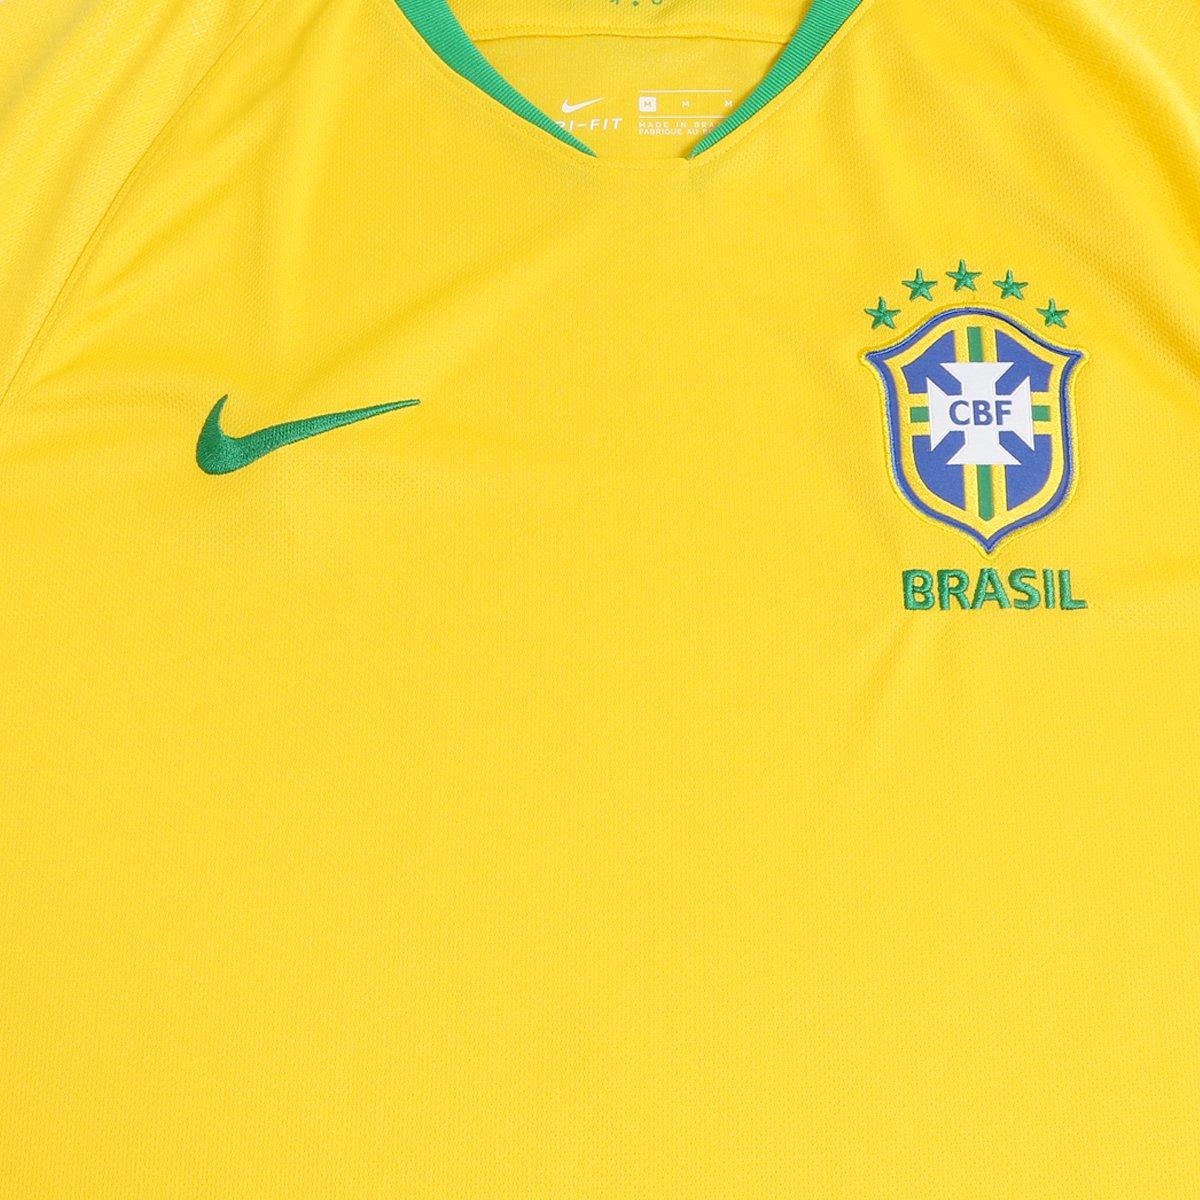 ... Camisa Seleção Brasil I 2018 nº 22 Fagner - Torcedor Nike Masculina ... 9add8e6a06705